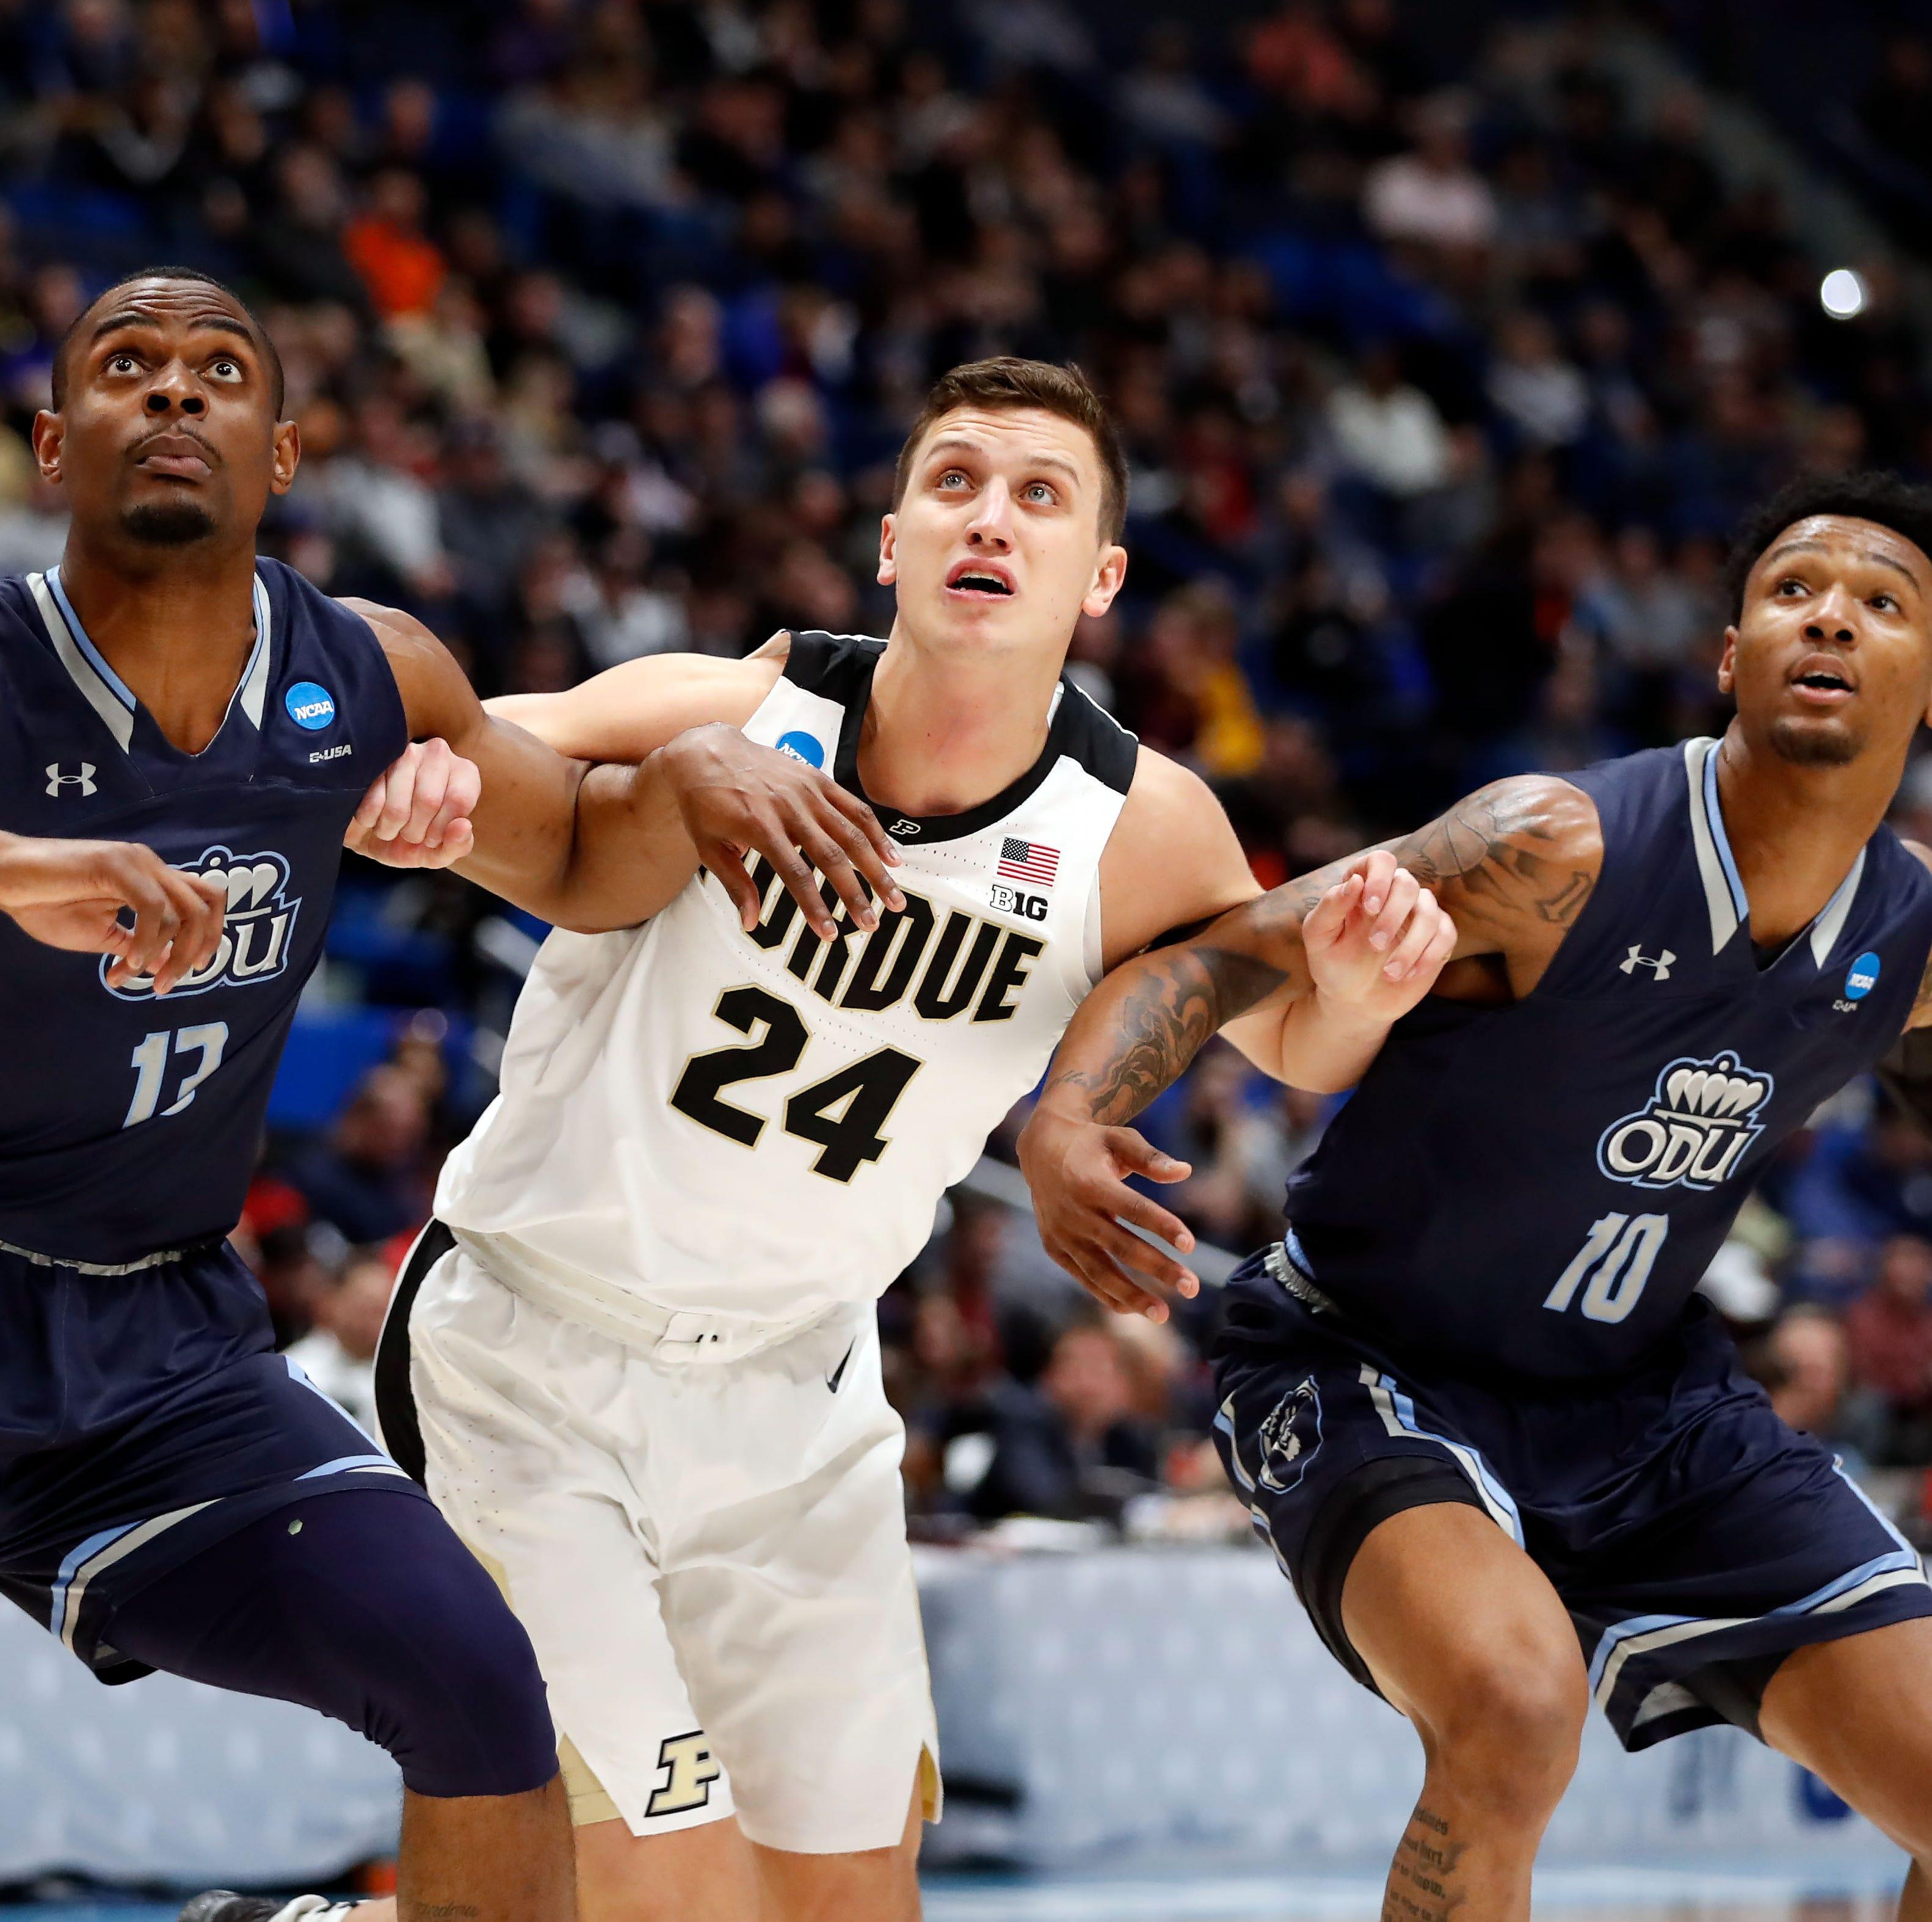 March Madness 2019: Scouting Purdue men's basketball vs. Villanova